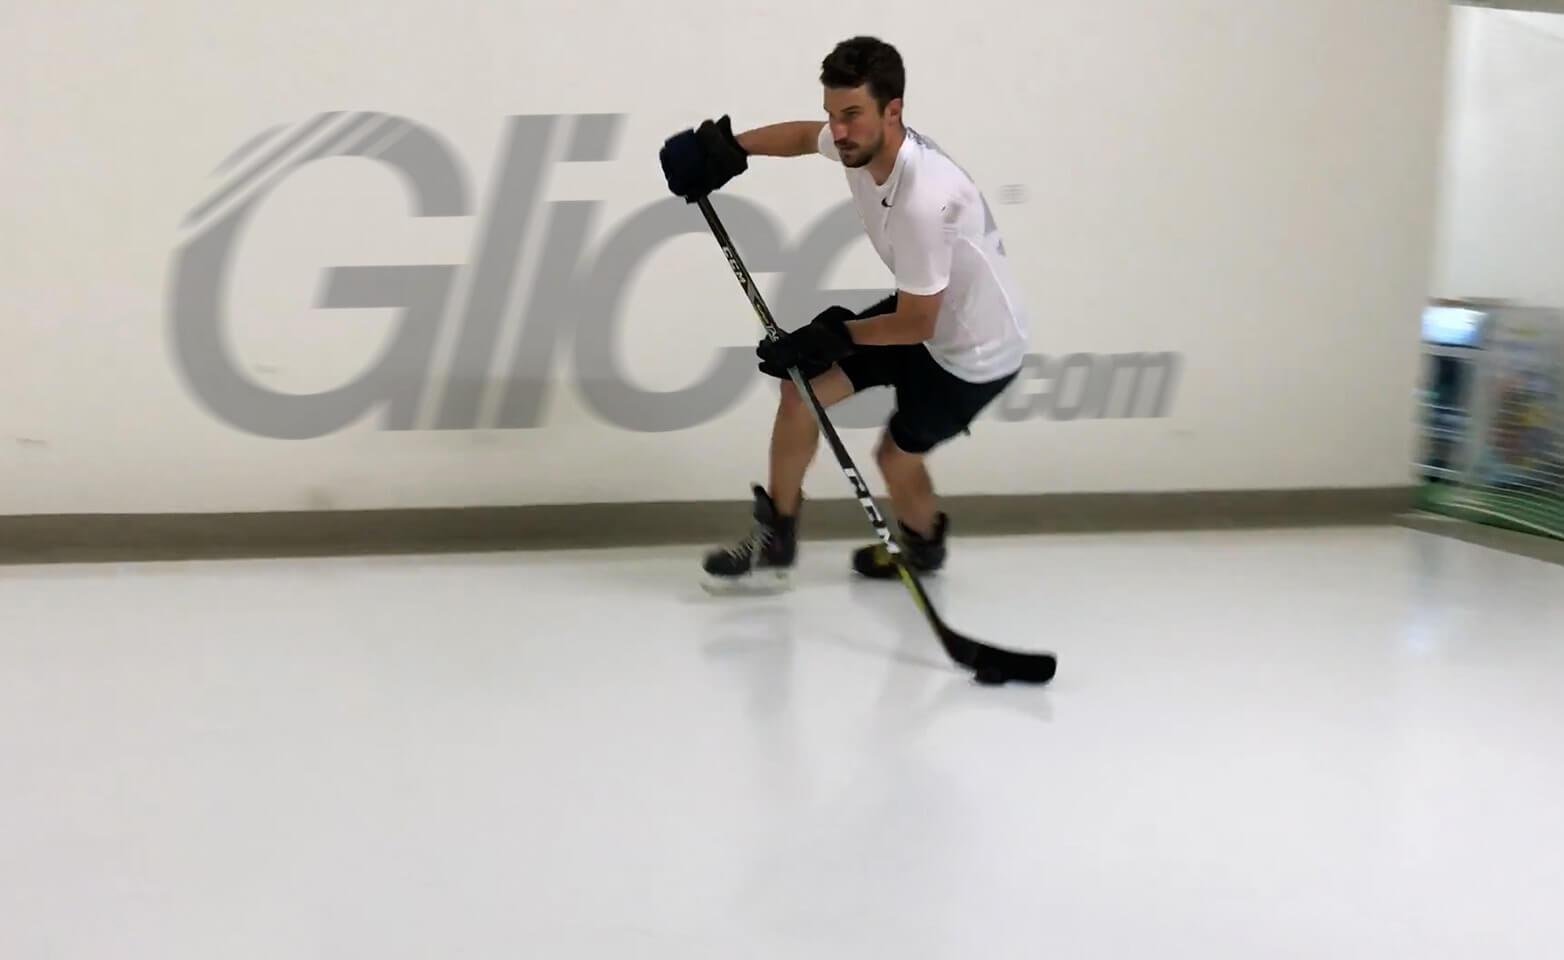 NHL All-Star & captain of Nashville Predators Roman Josi training on synthetic ice sheets